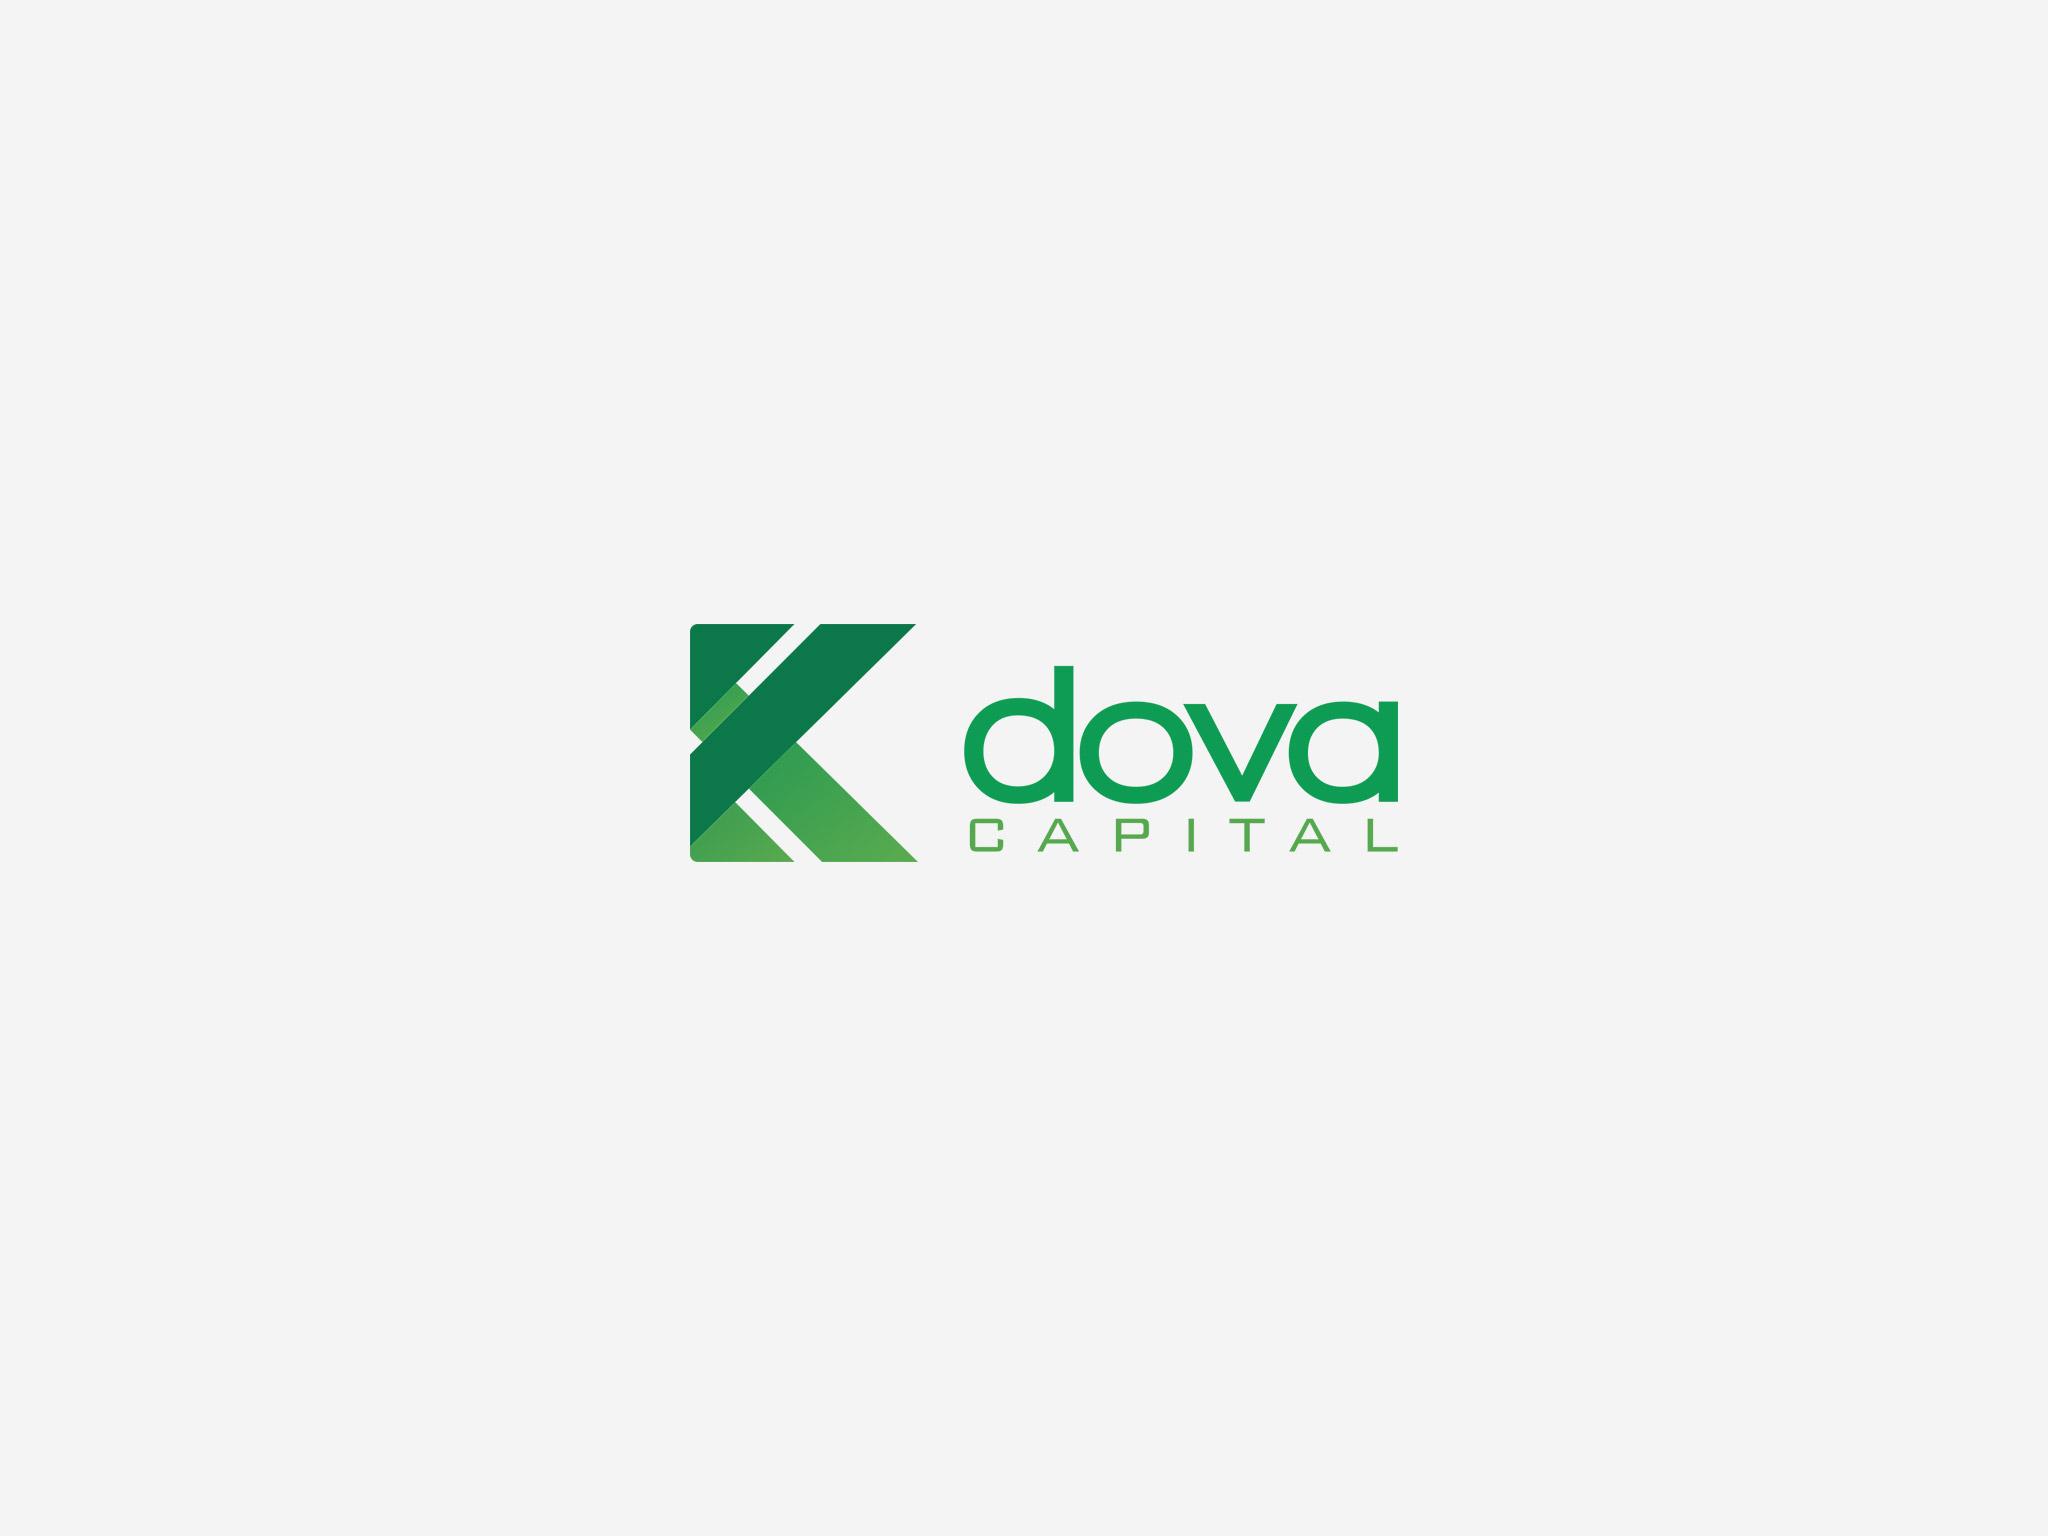 identitate-vizuala-dova-capital